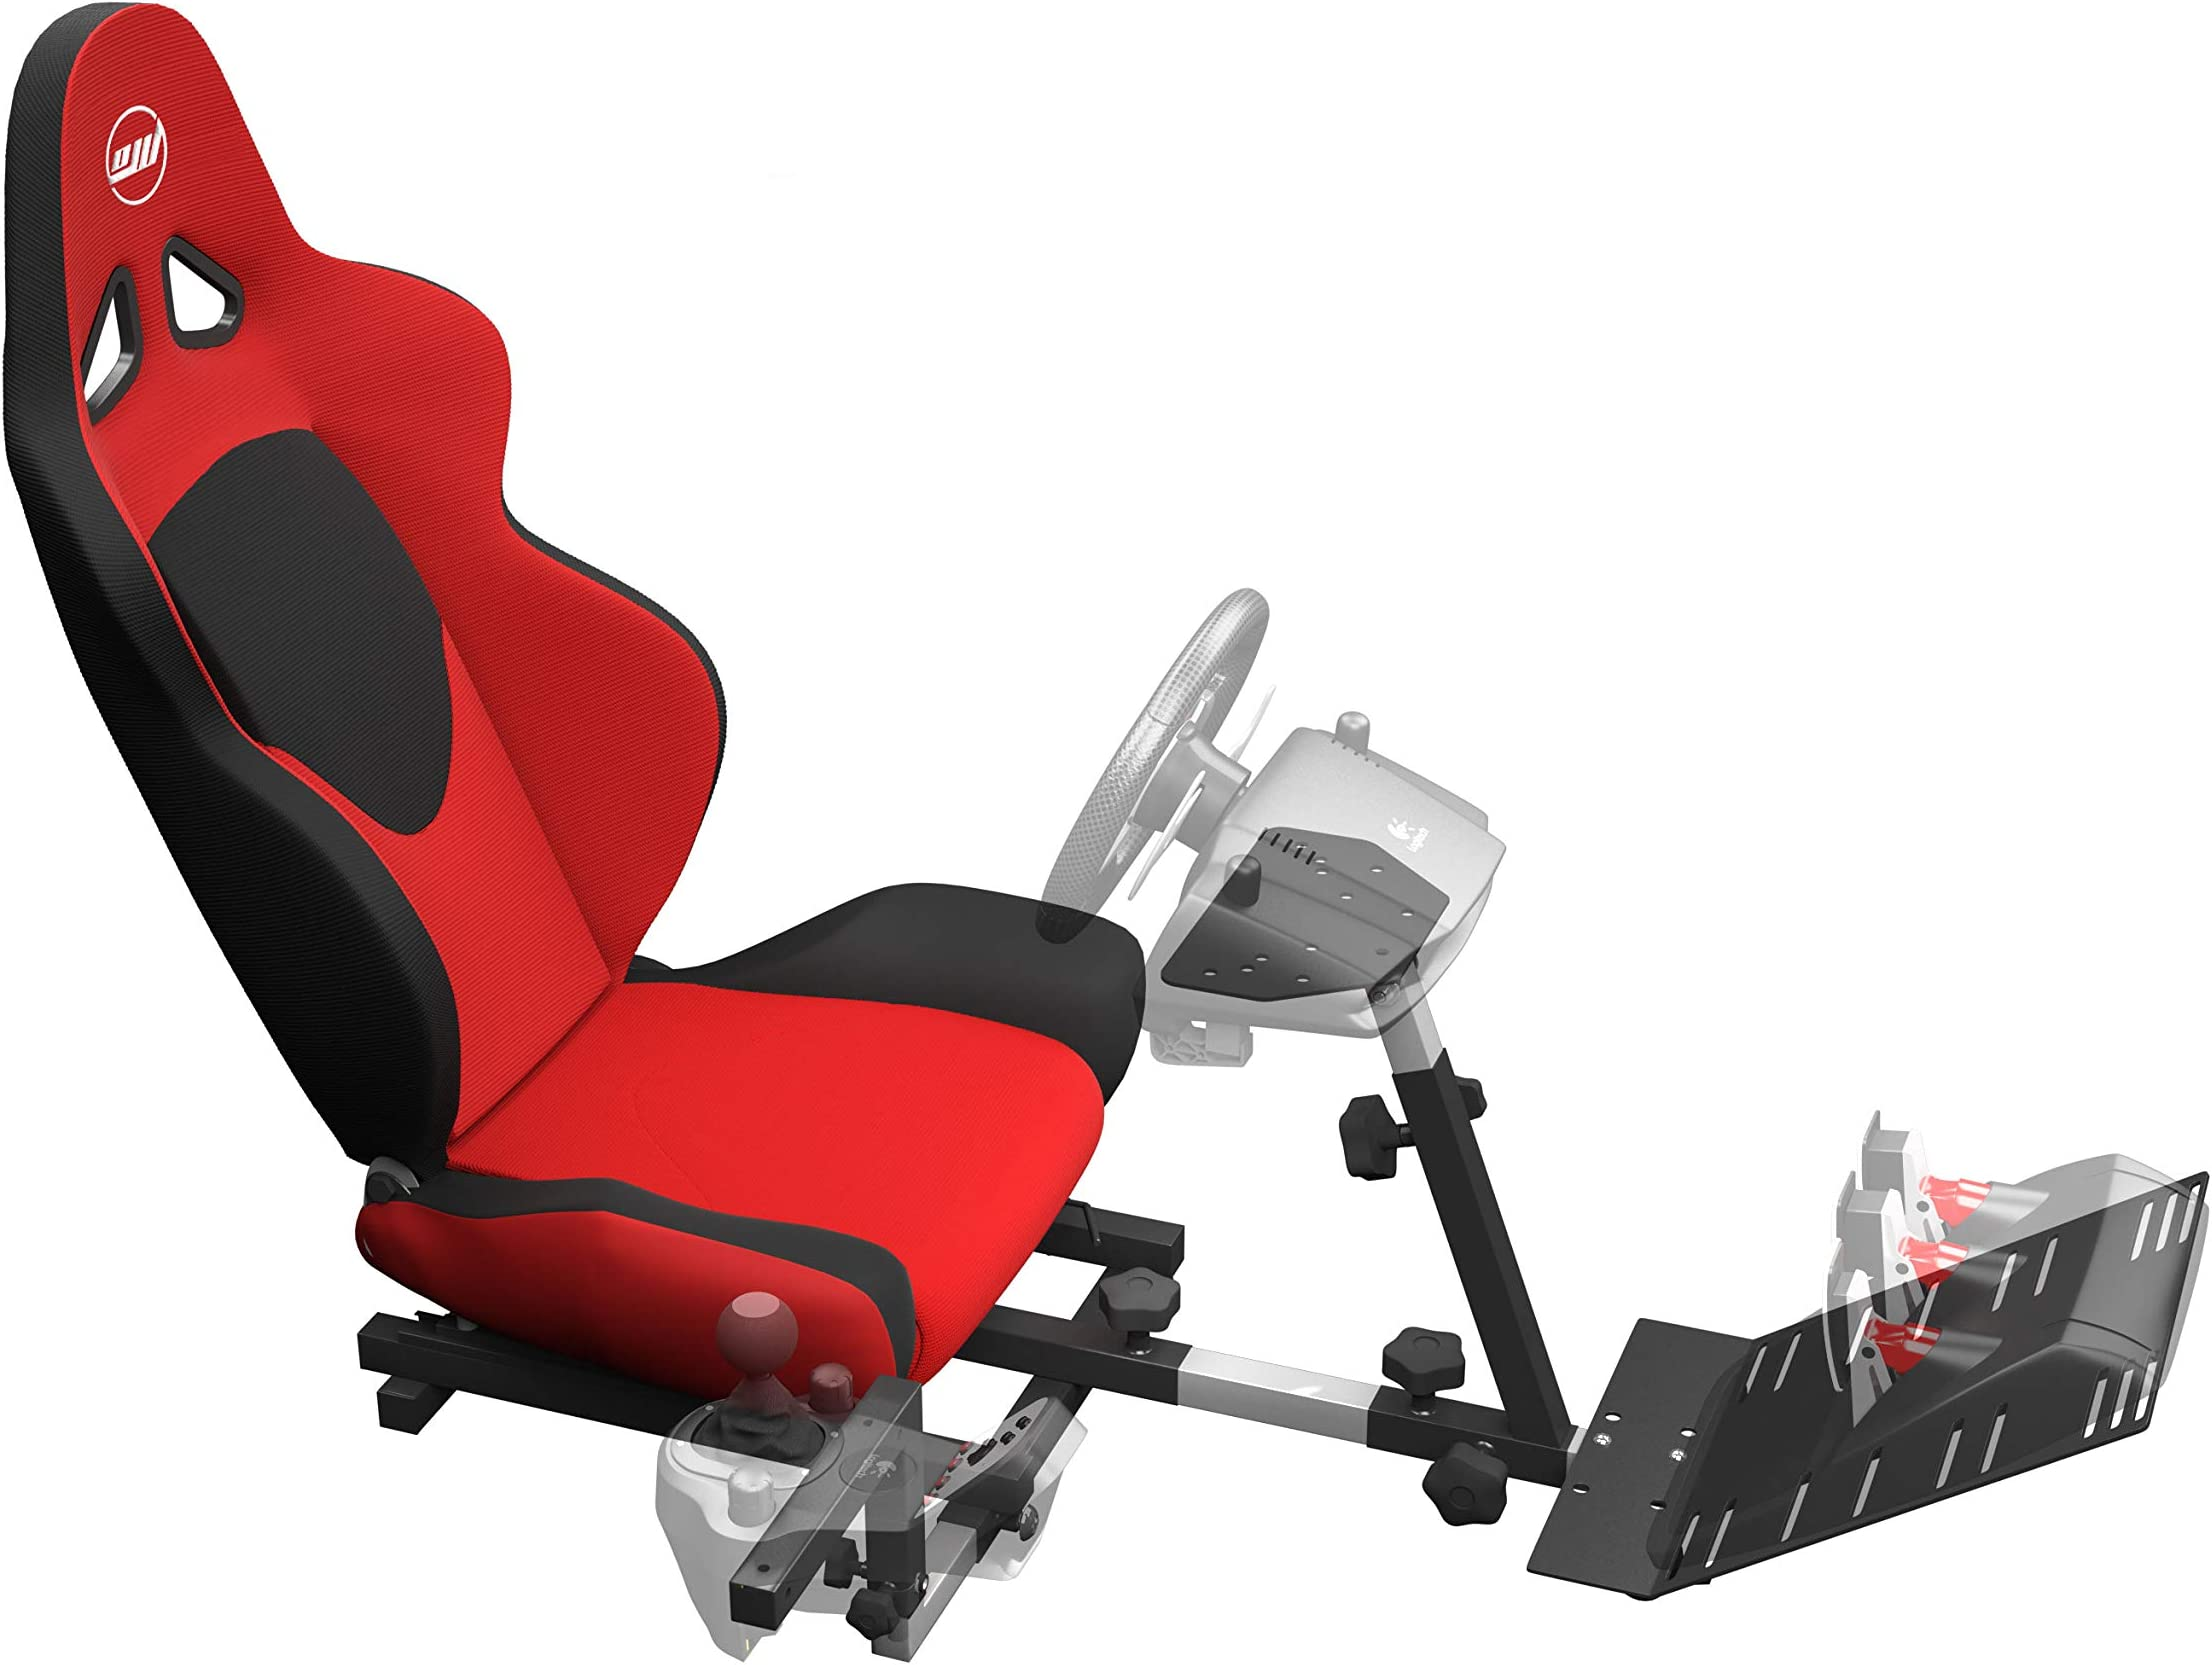 The Best Racing Simulator Cockpits 2019 | Petter Solberg's